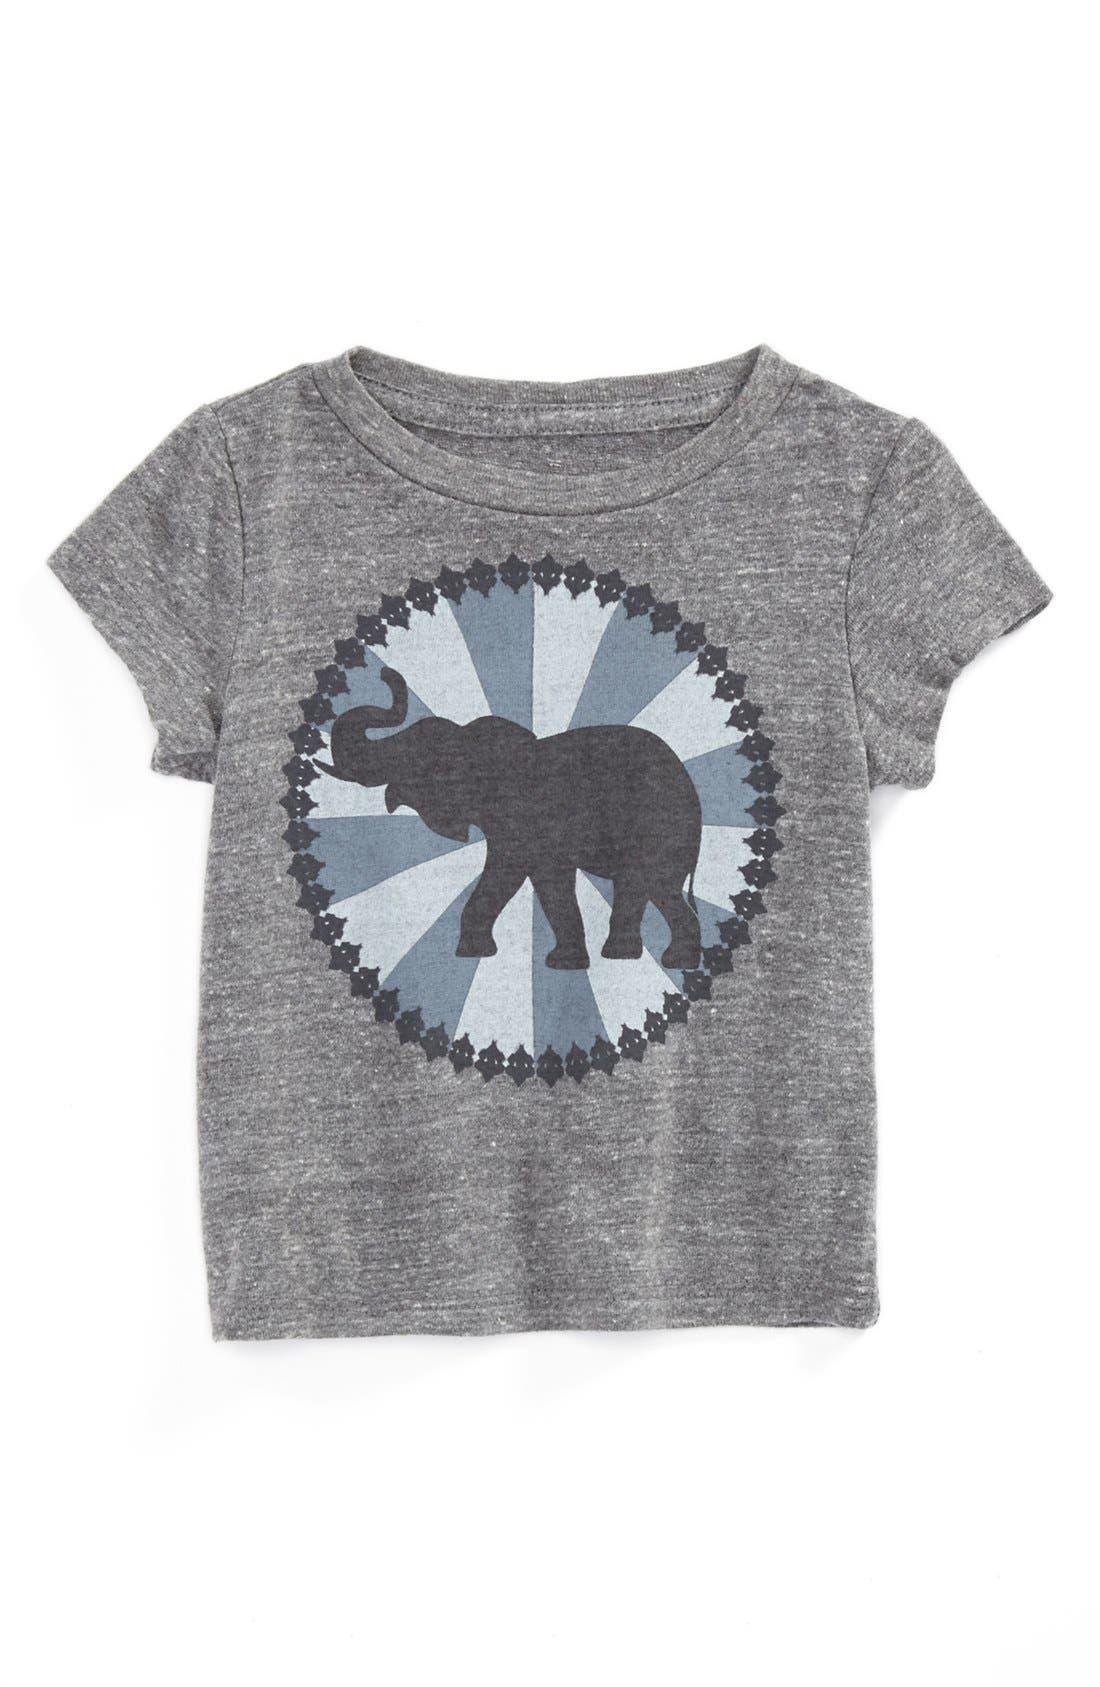 Alternate Image 1 Selected - Peek 'Baby Elephant' Tee (Baby Girls)